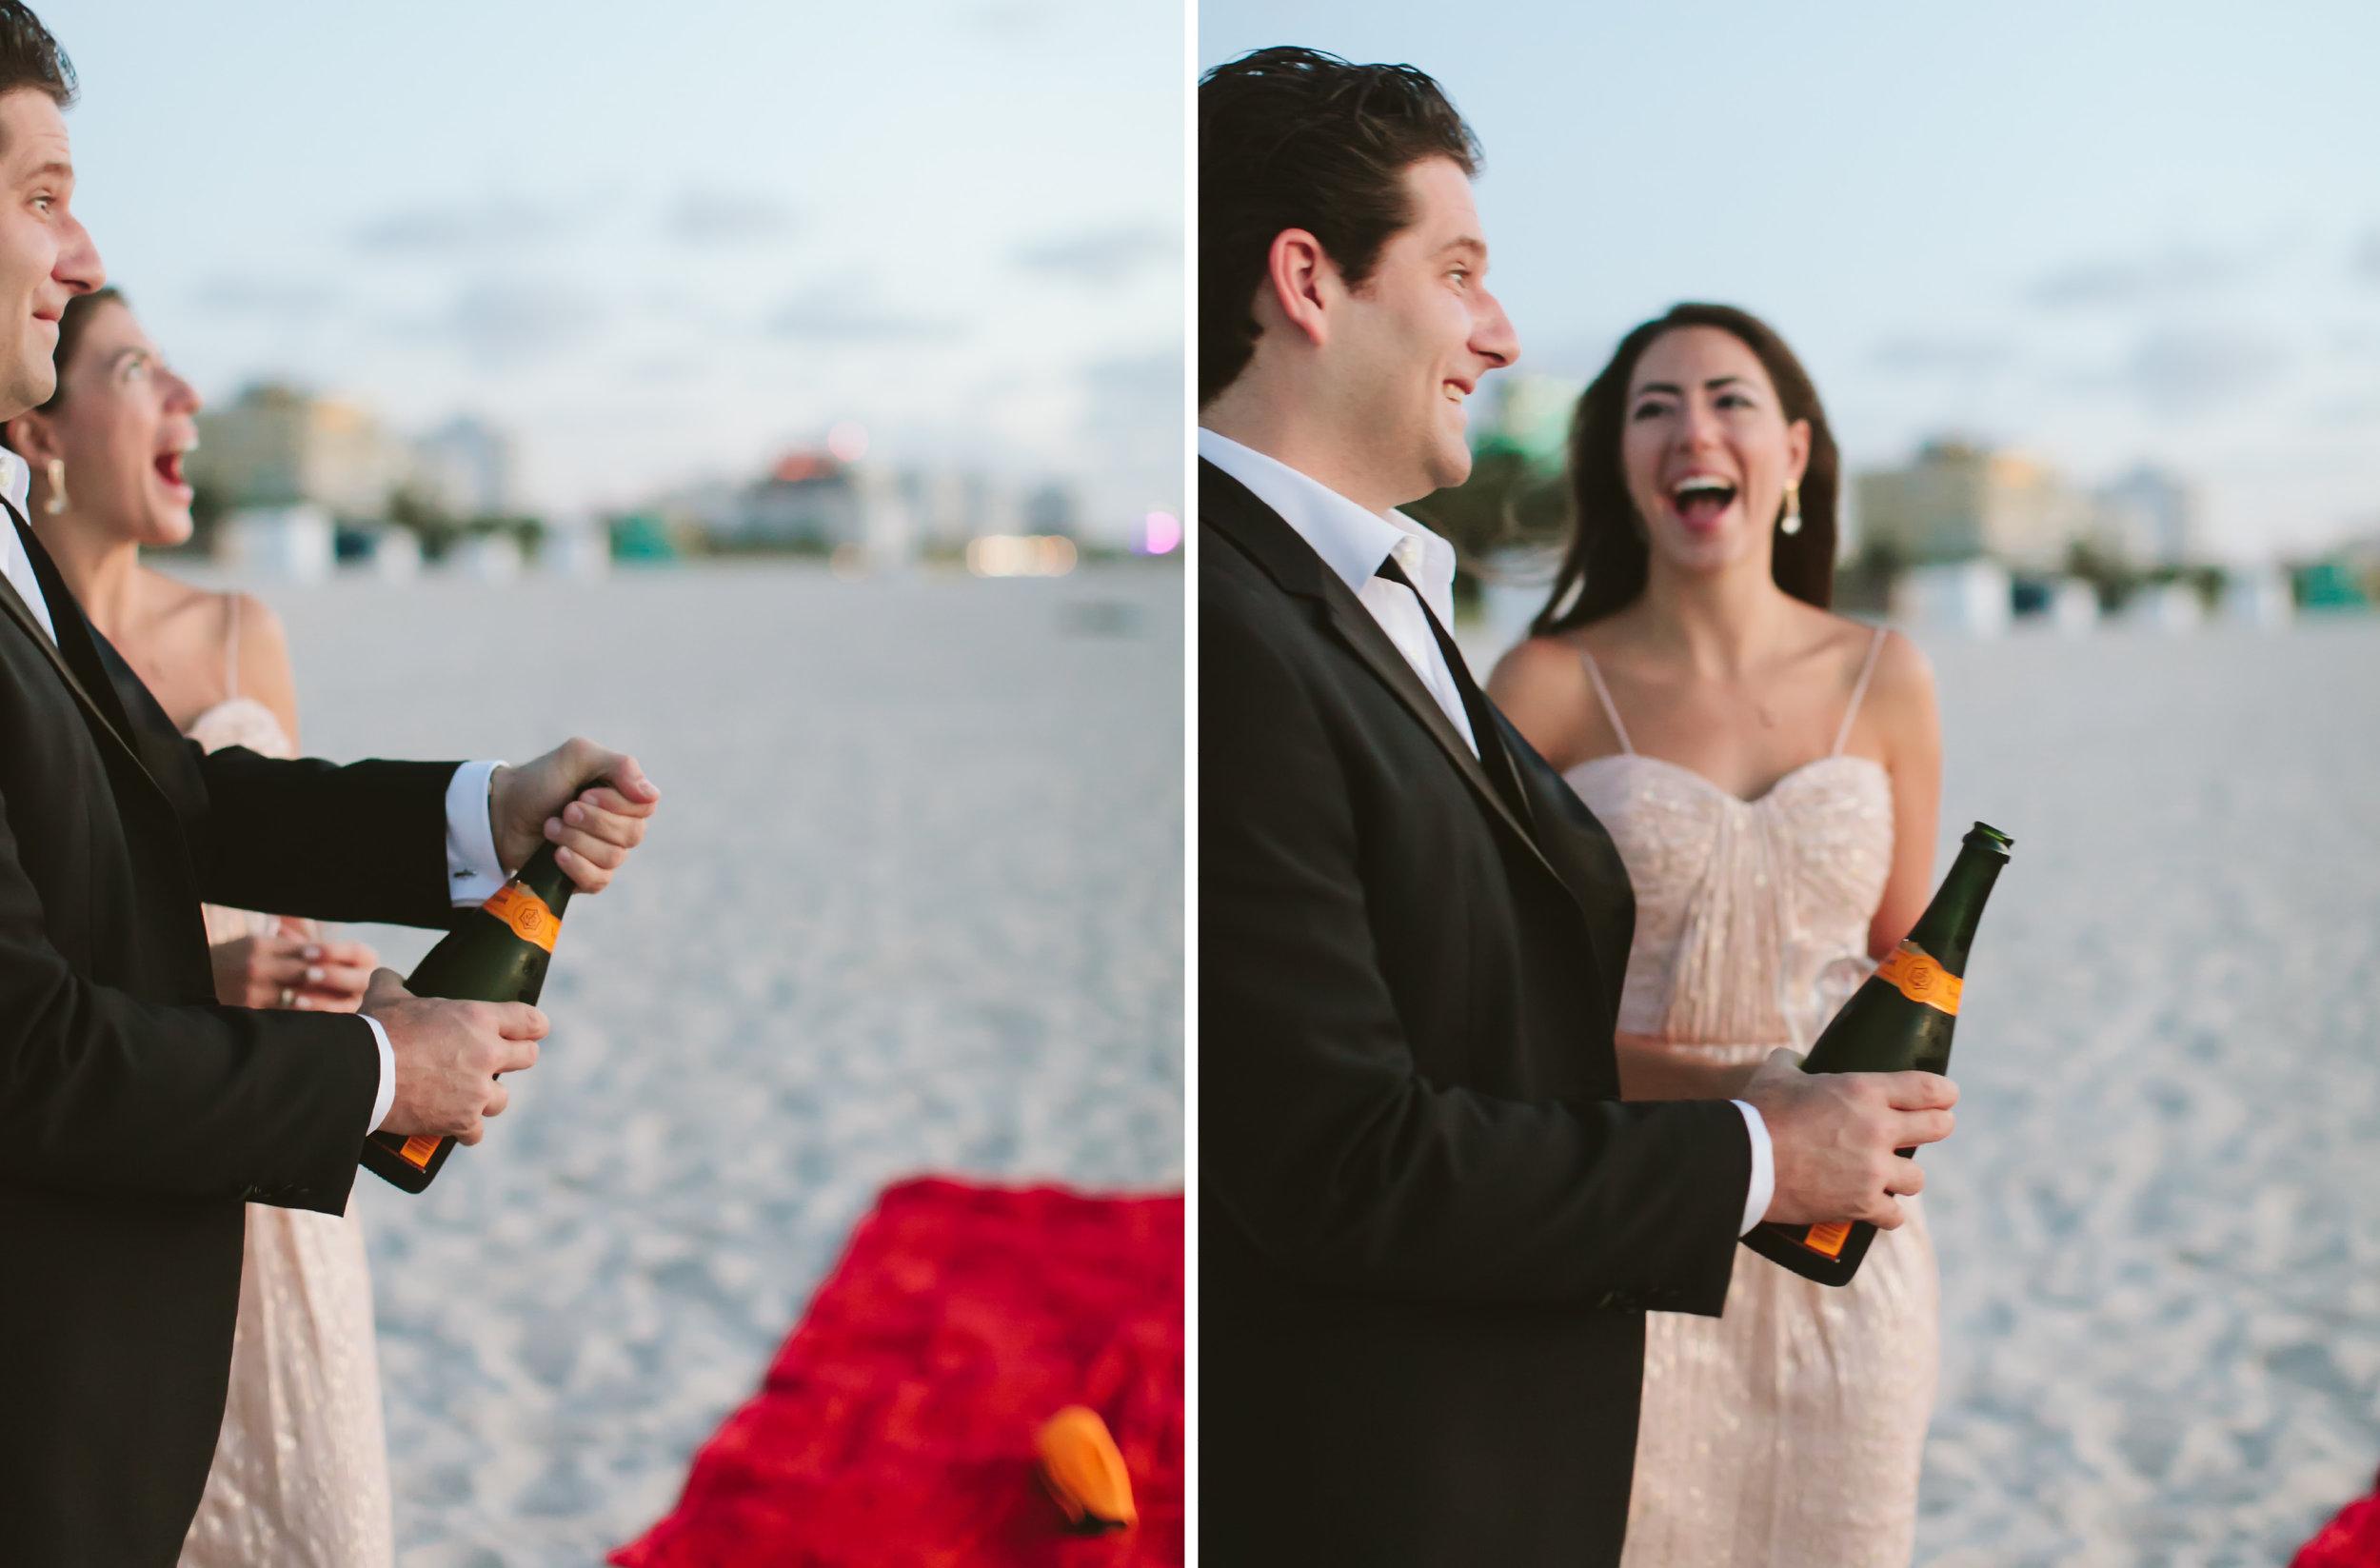 Meli + Mike South Pointe Park South Beach Miami Engagement Shoot5.jpg